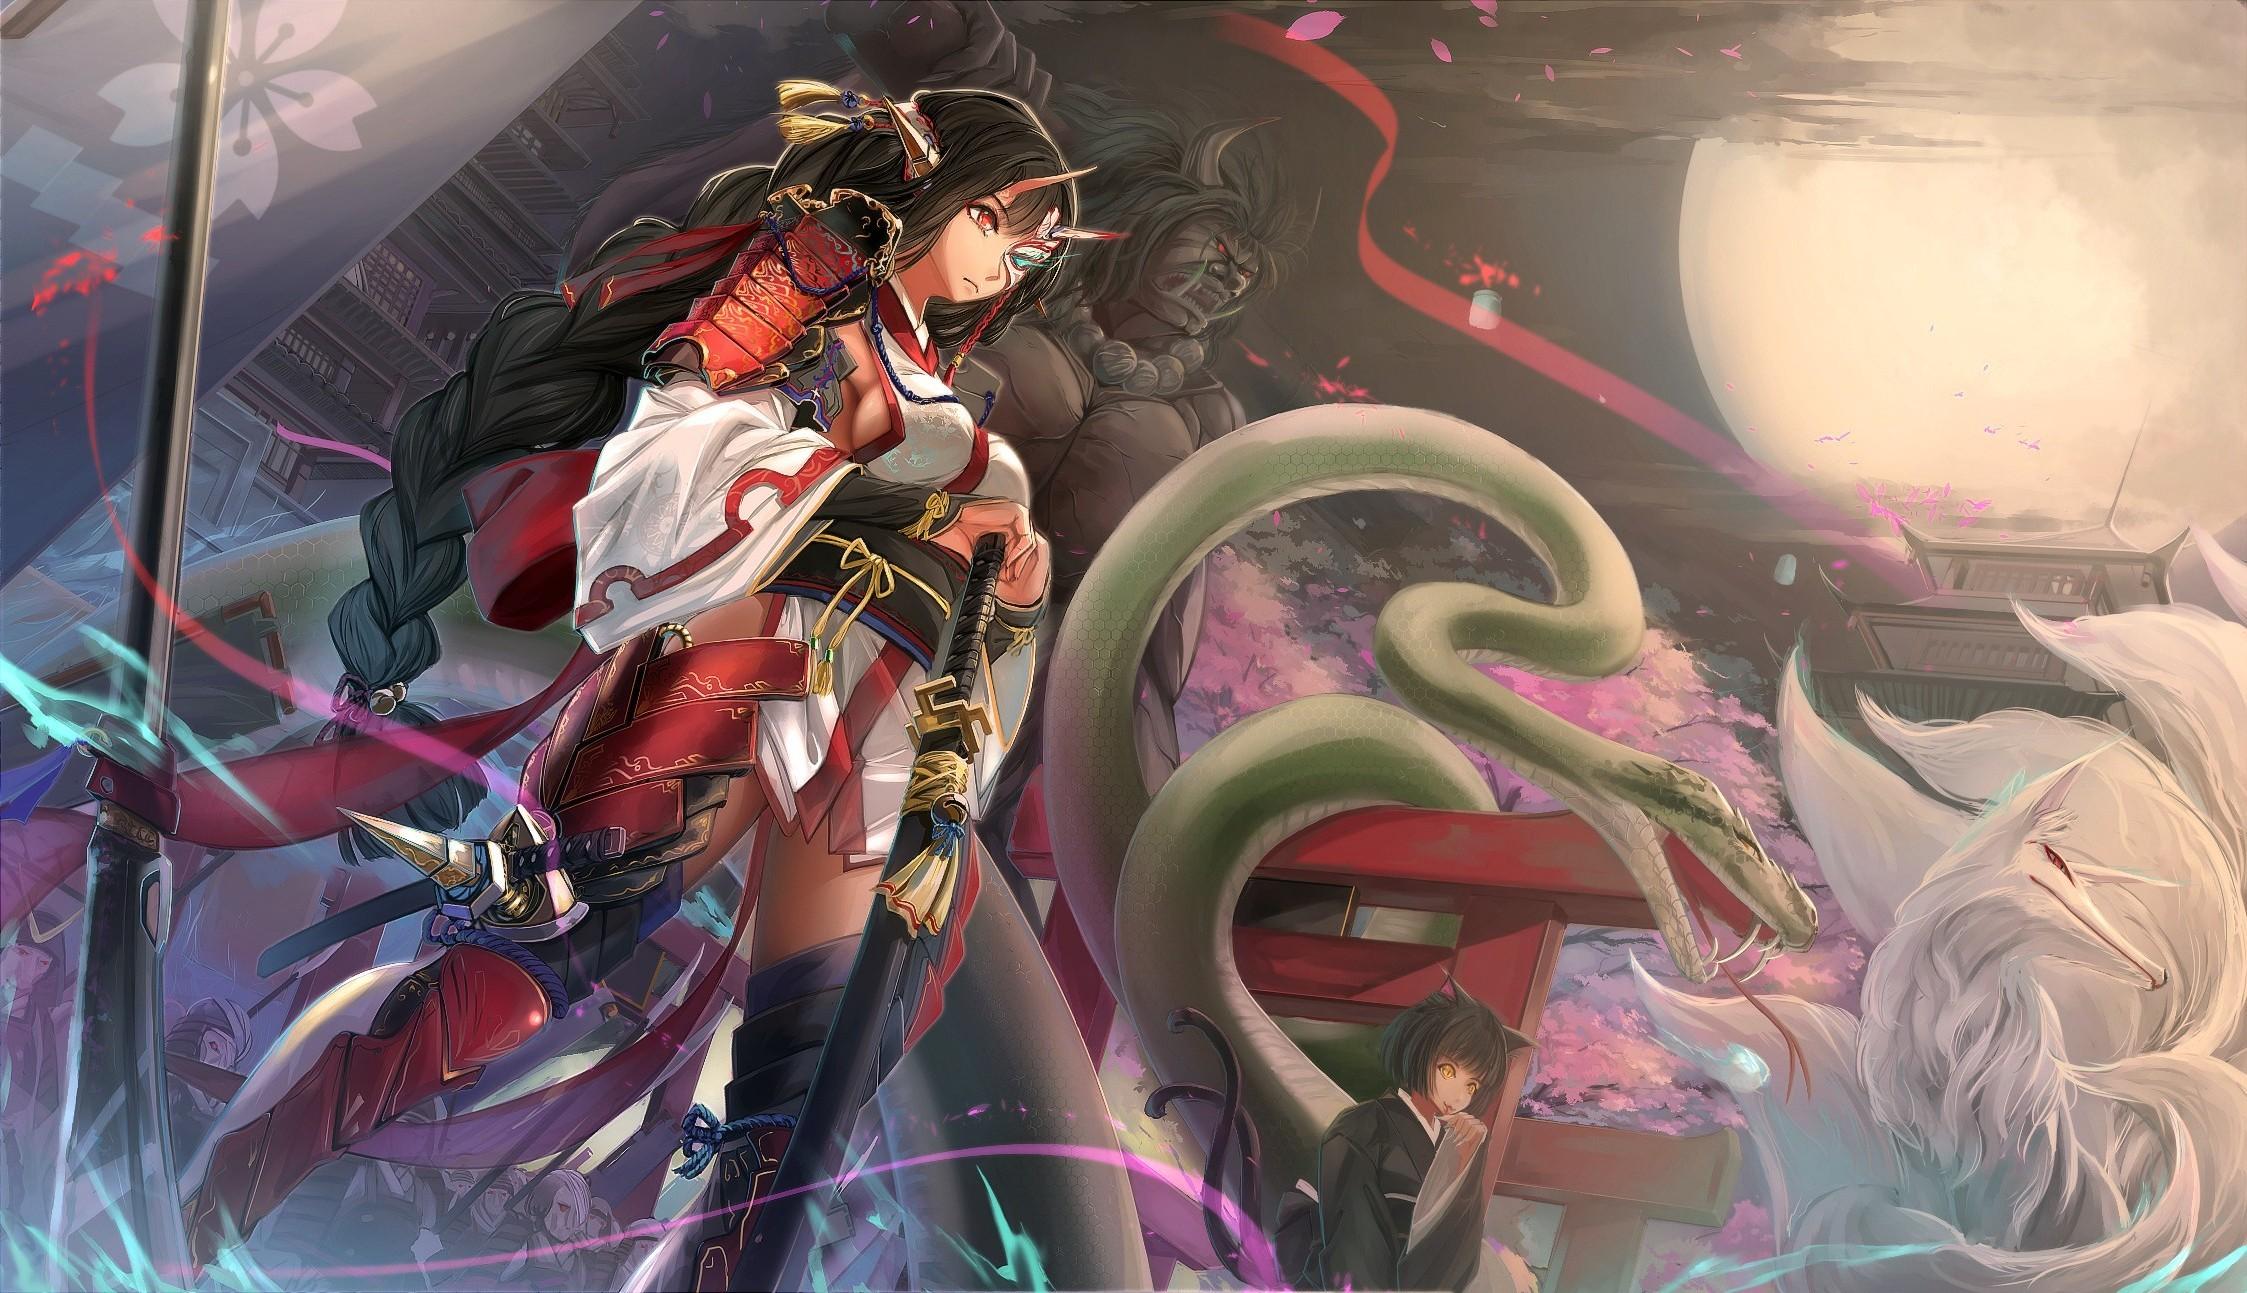 anime, Anime Girls, Original Characters, Snake, Fox, Samurai, Sword, Armor  Wallpapers HD / Desktop and Mobile Backgrounds